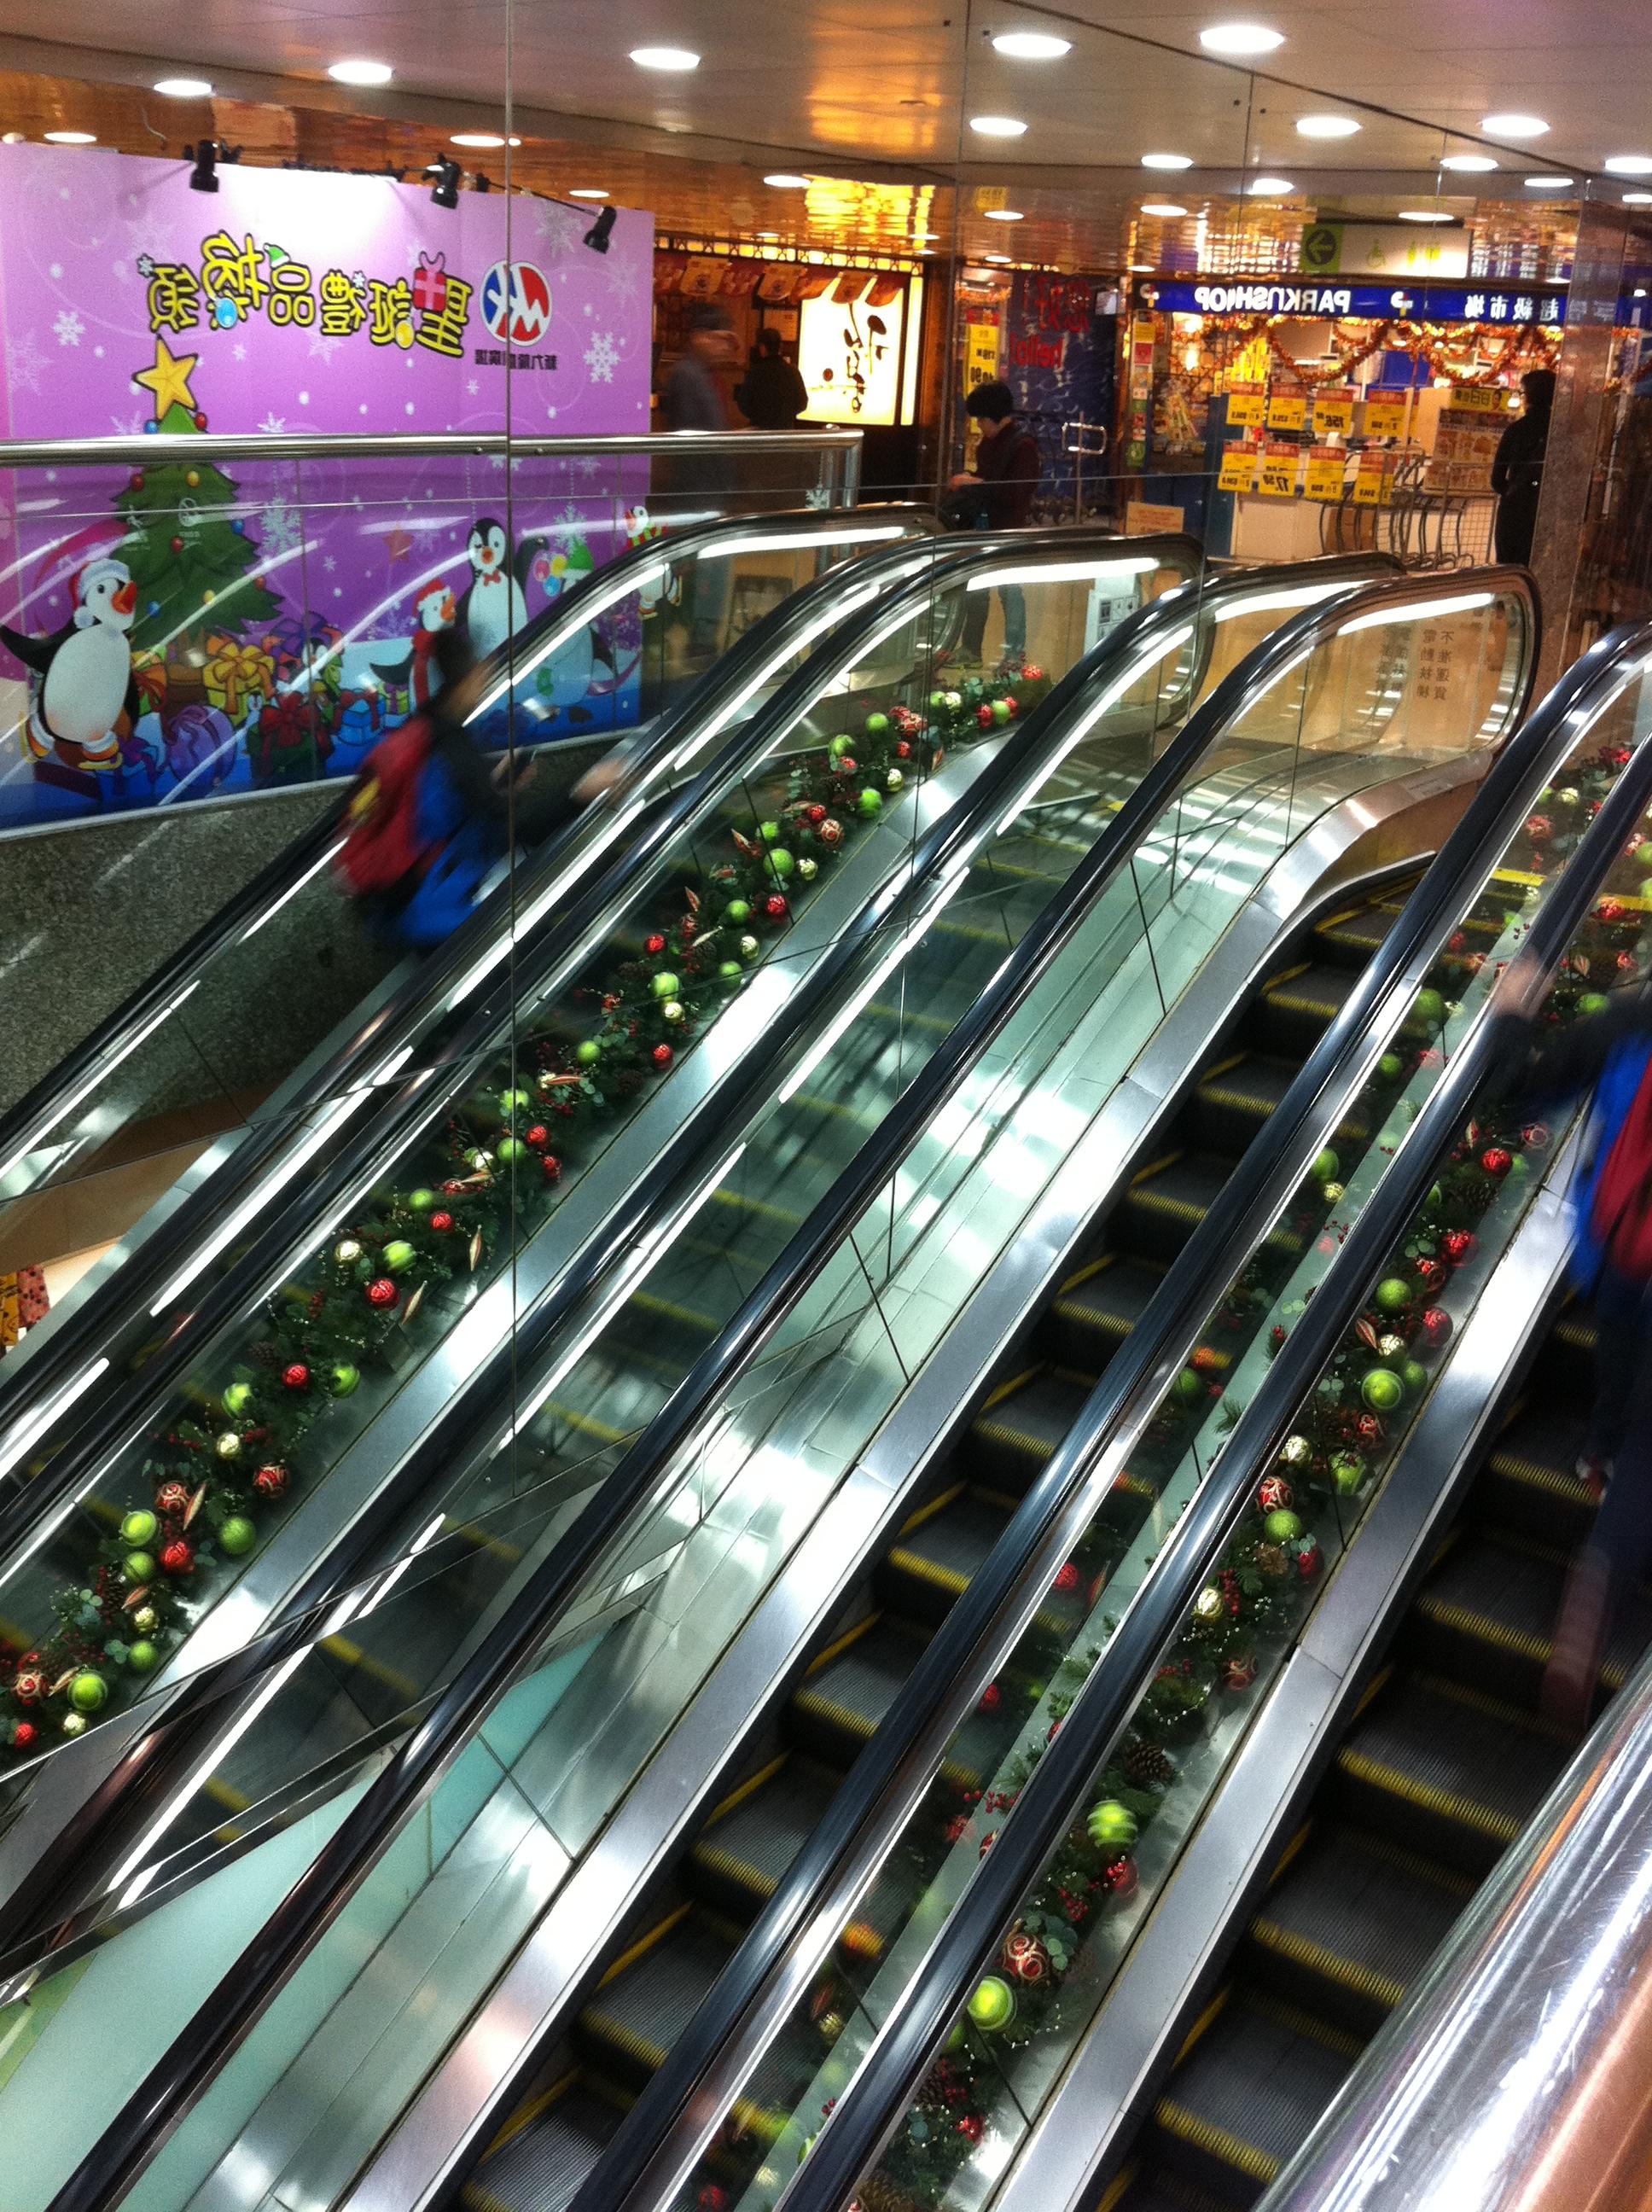 File:HK Tai Kok Tsui evening 新九龍廣場 New Kowloon Plaza upper escalators Dec-2012.JPG - Wikimedia Commons